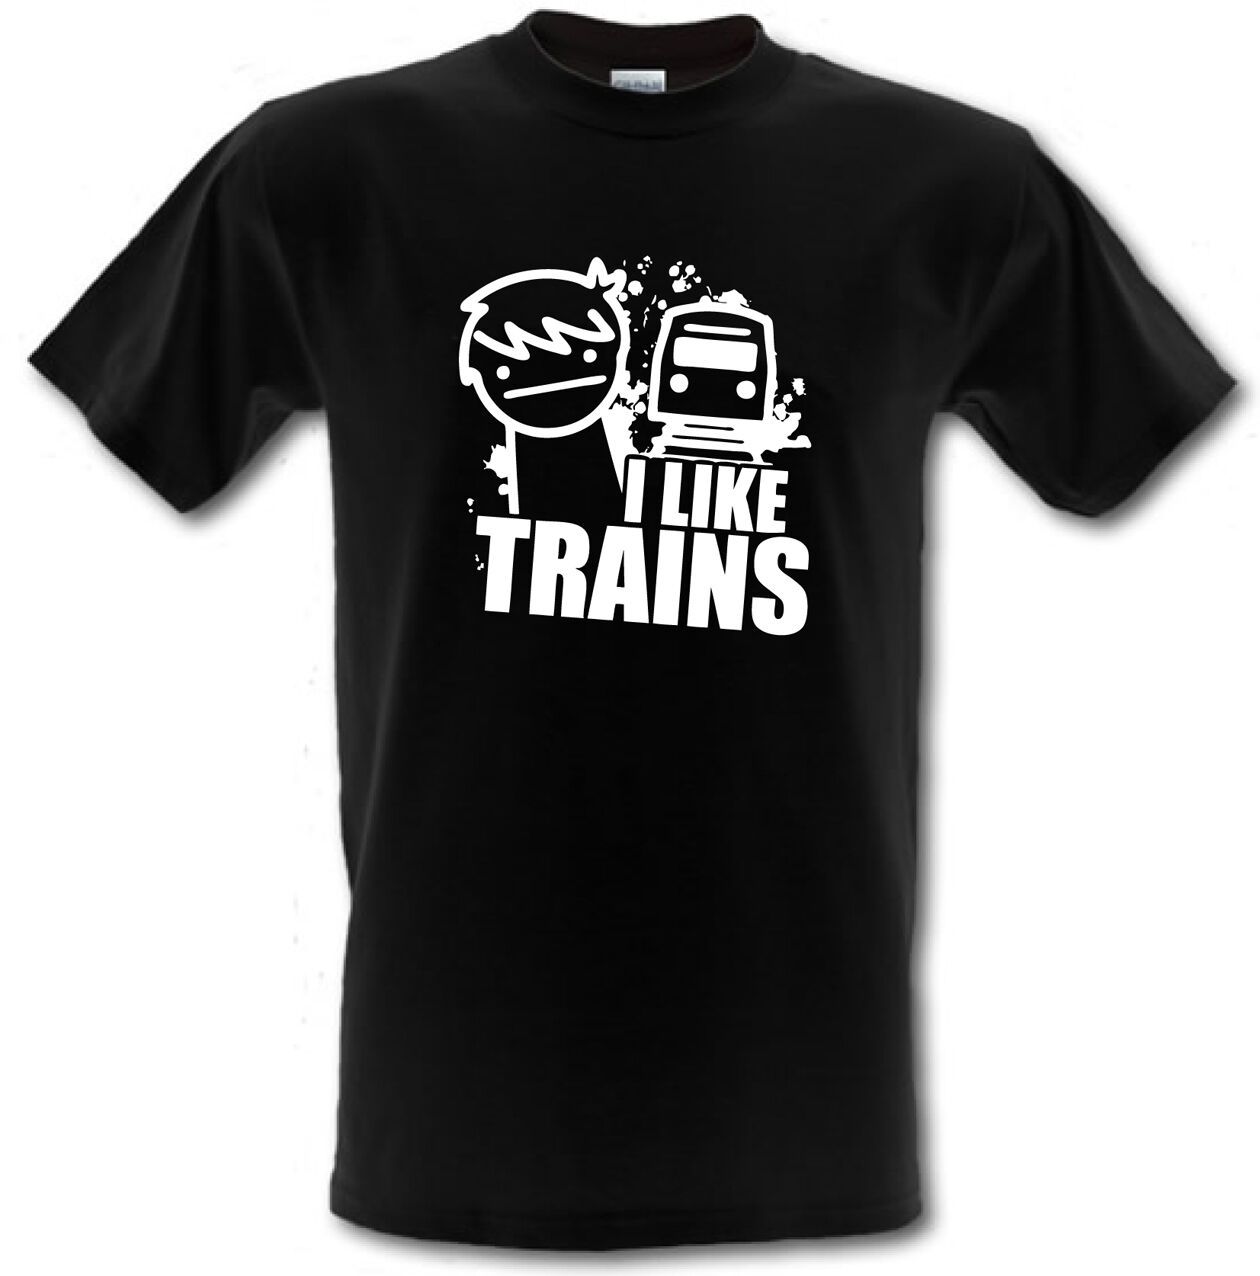 ASDF I LIKE TRAINS  Cult Cartoon Gamer Children/'s t-shirt **ALL AGES**